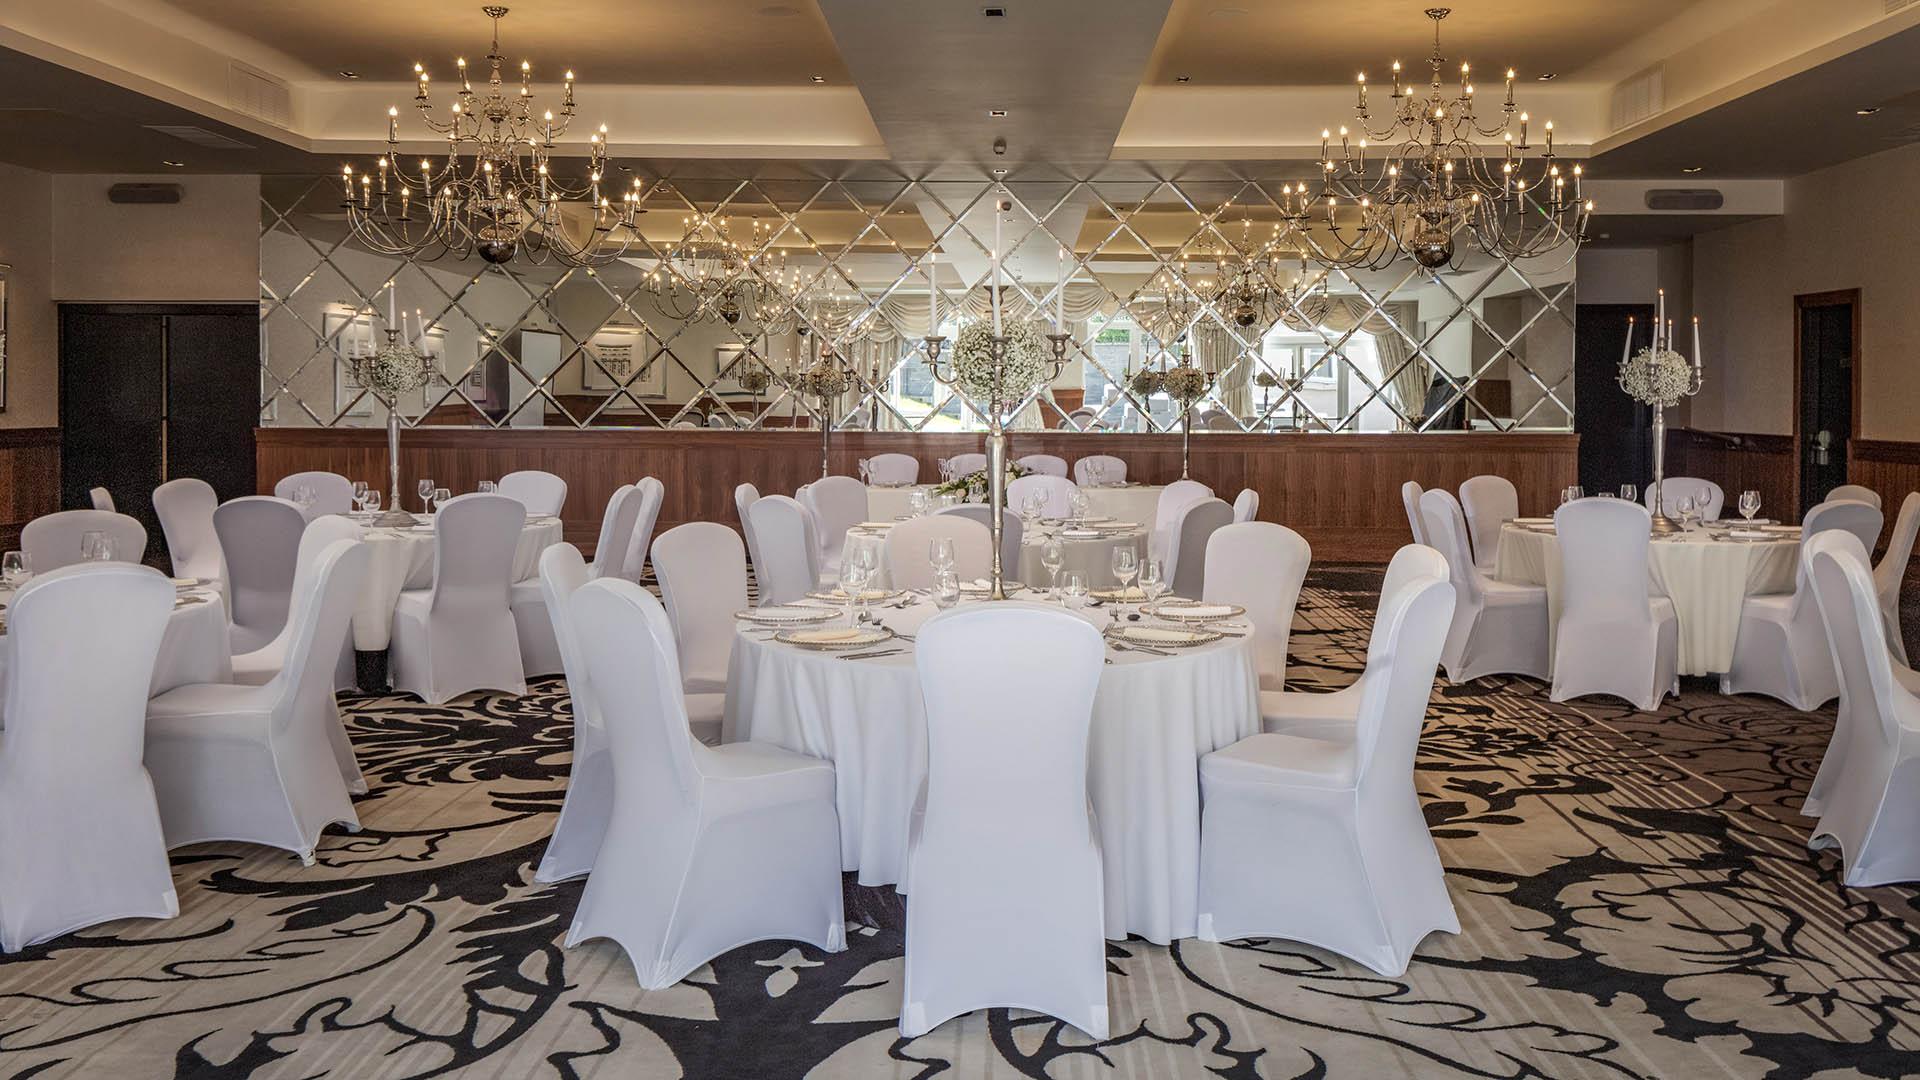 hotelcolessio_Wedding_Ballroom10_510x300